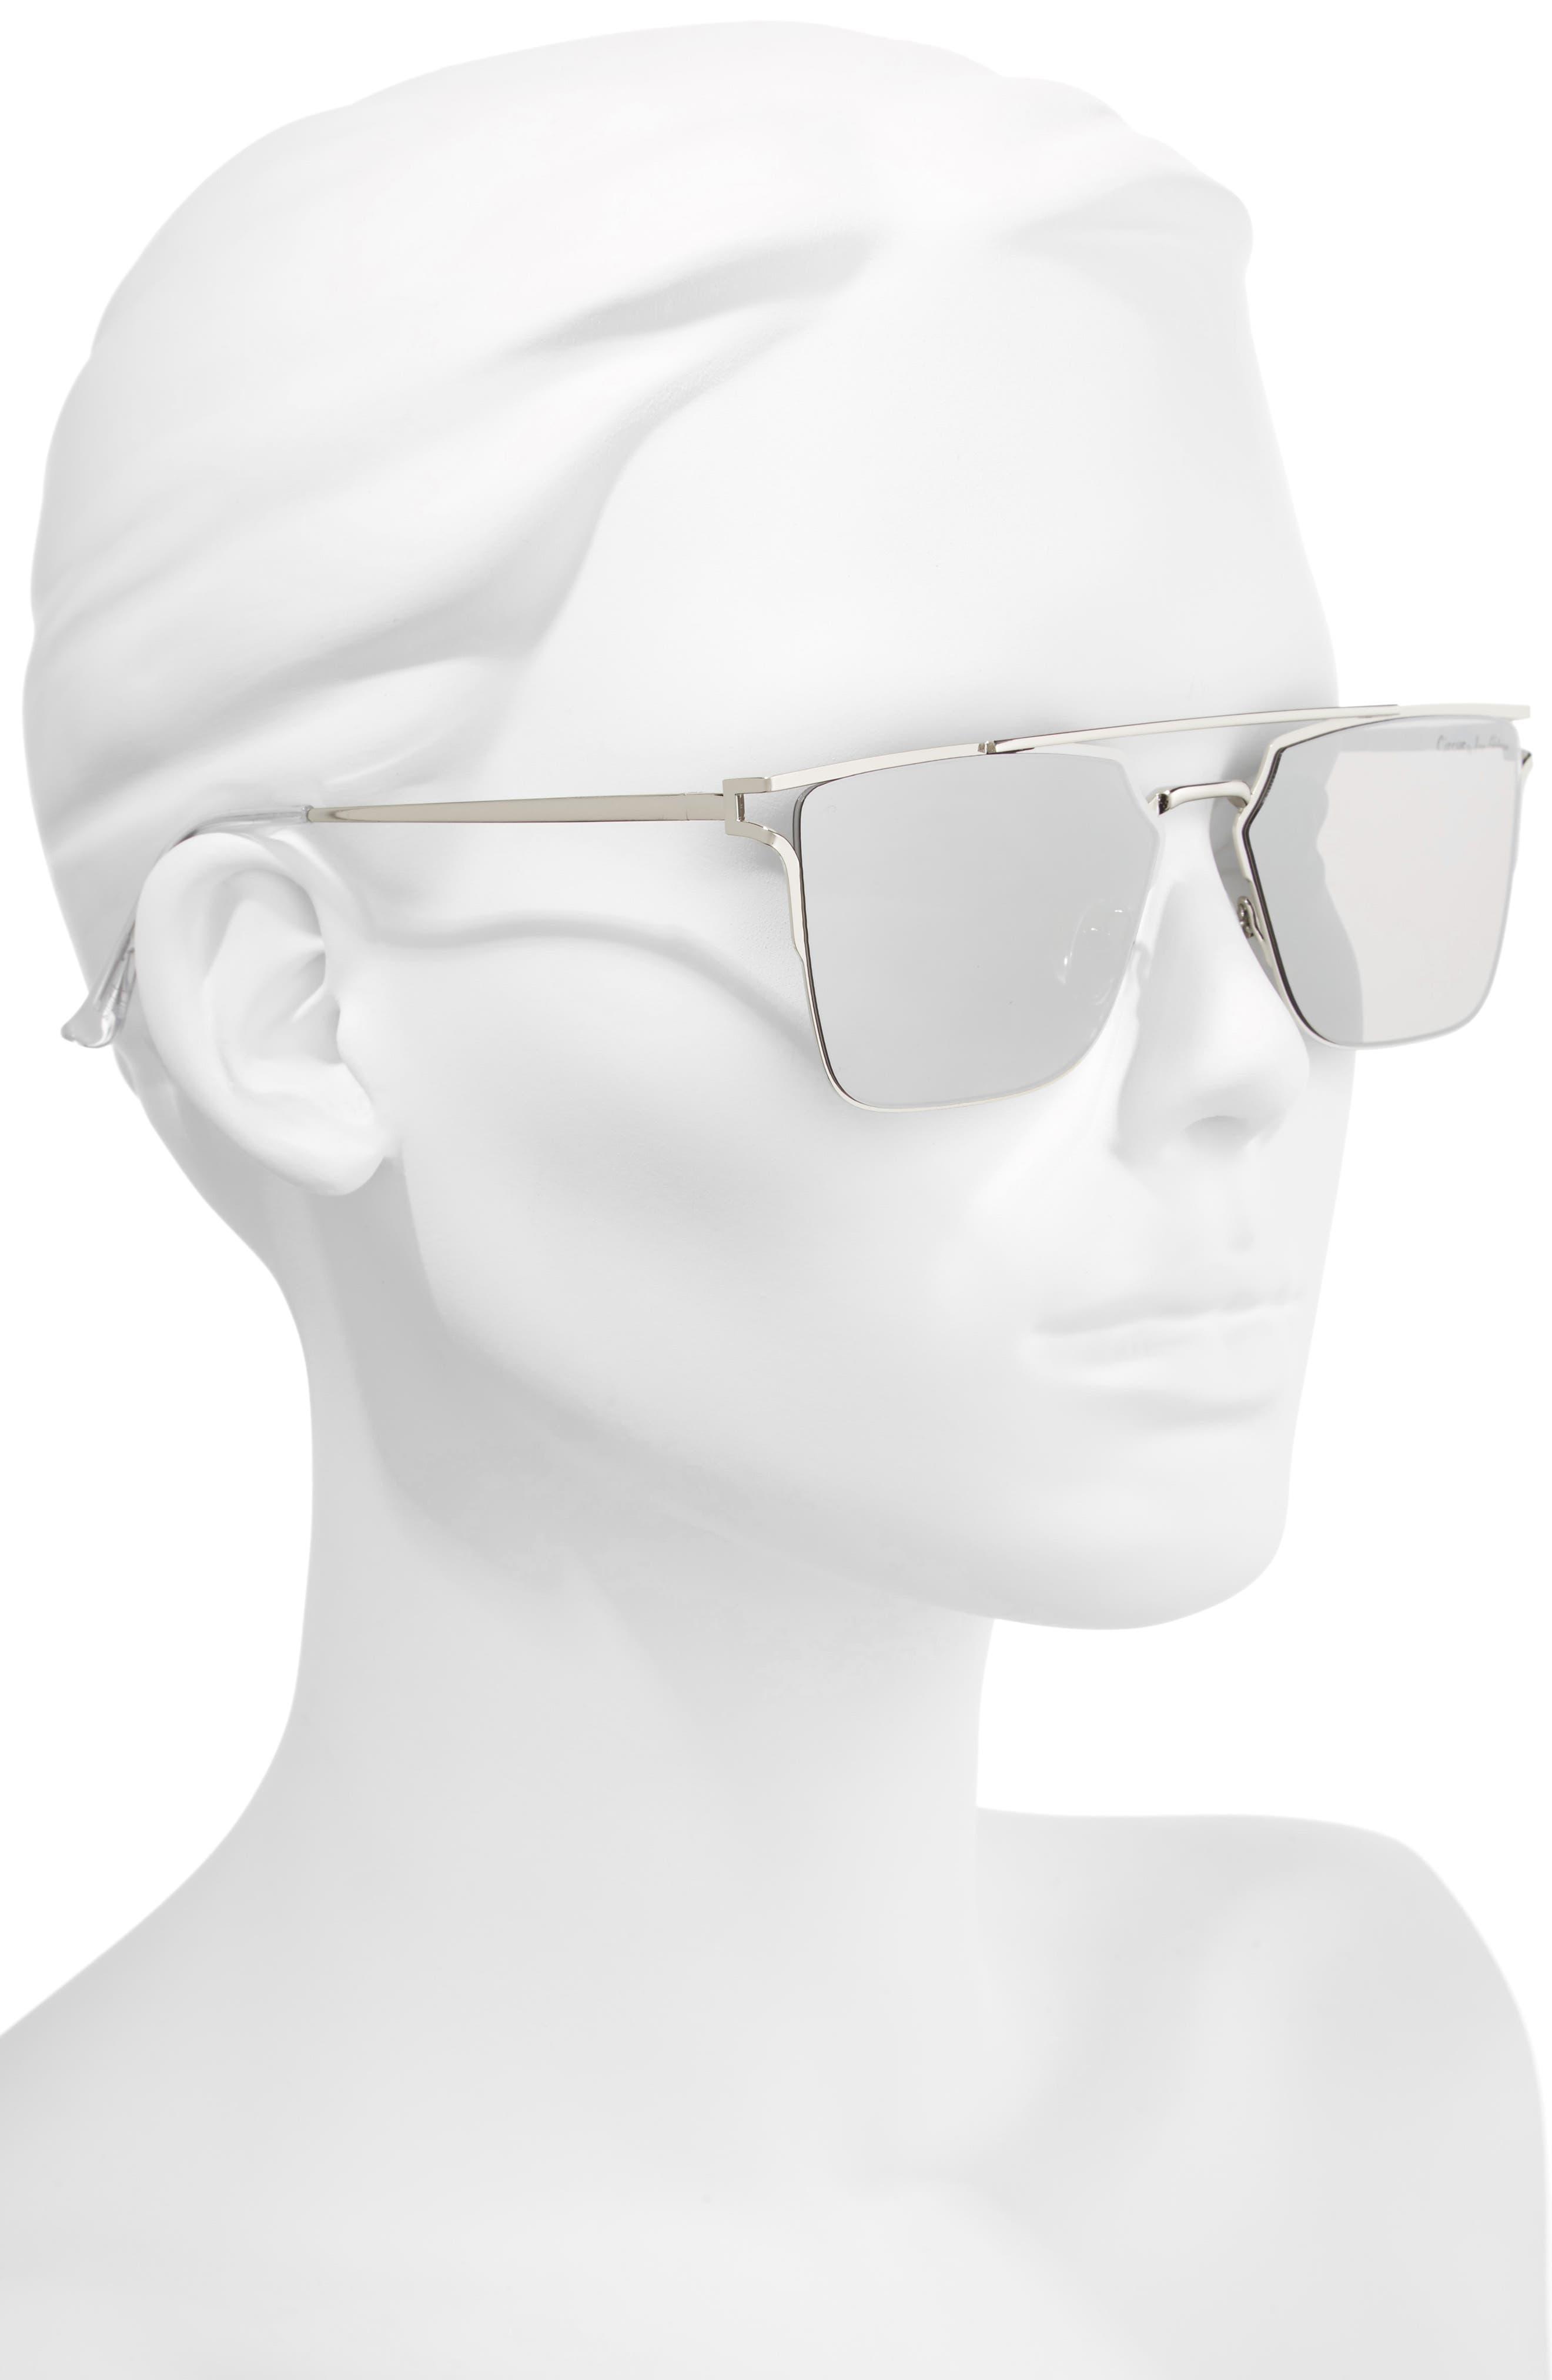 56mm Flat Top Sunglasses,                             Alternate thumbnail 5, color,